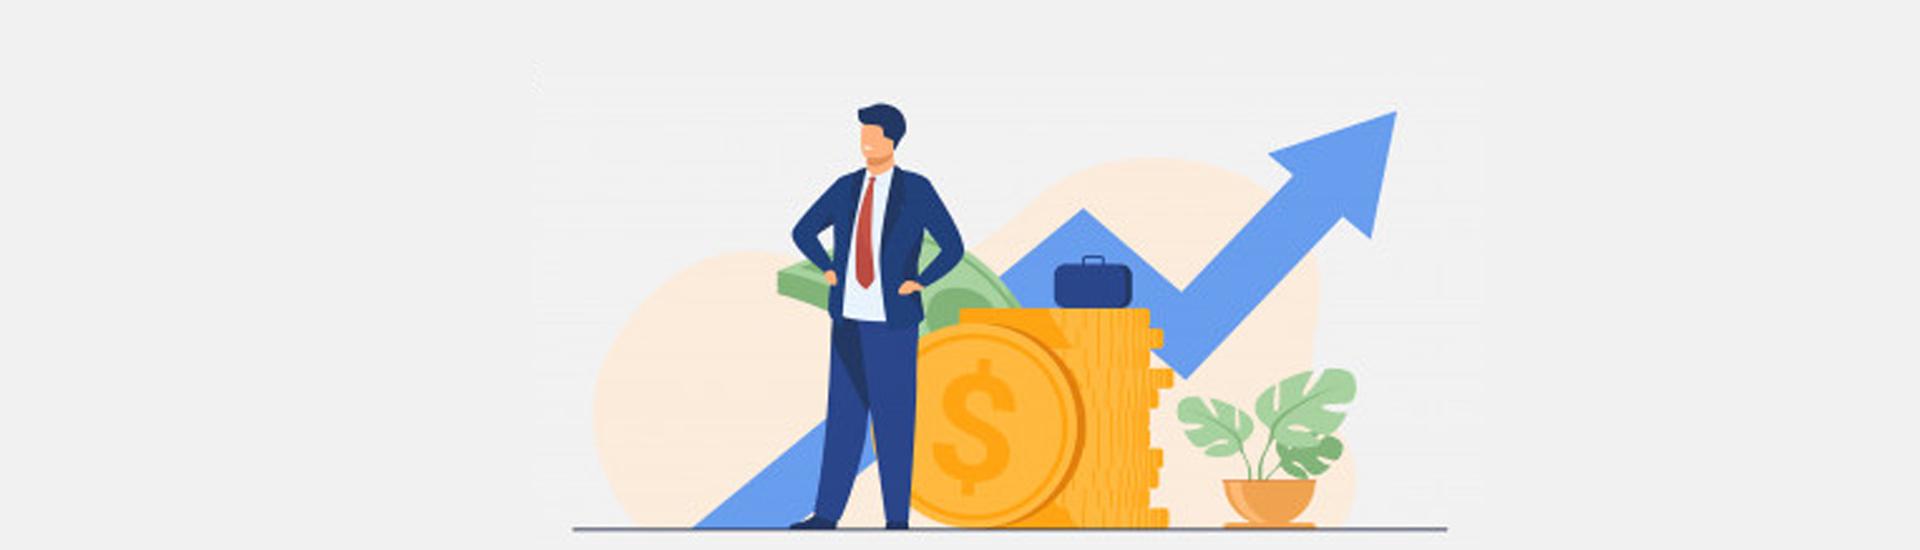 finance analytics course 2022